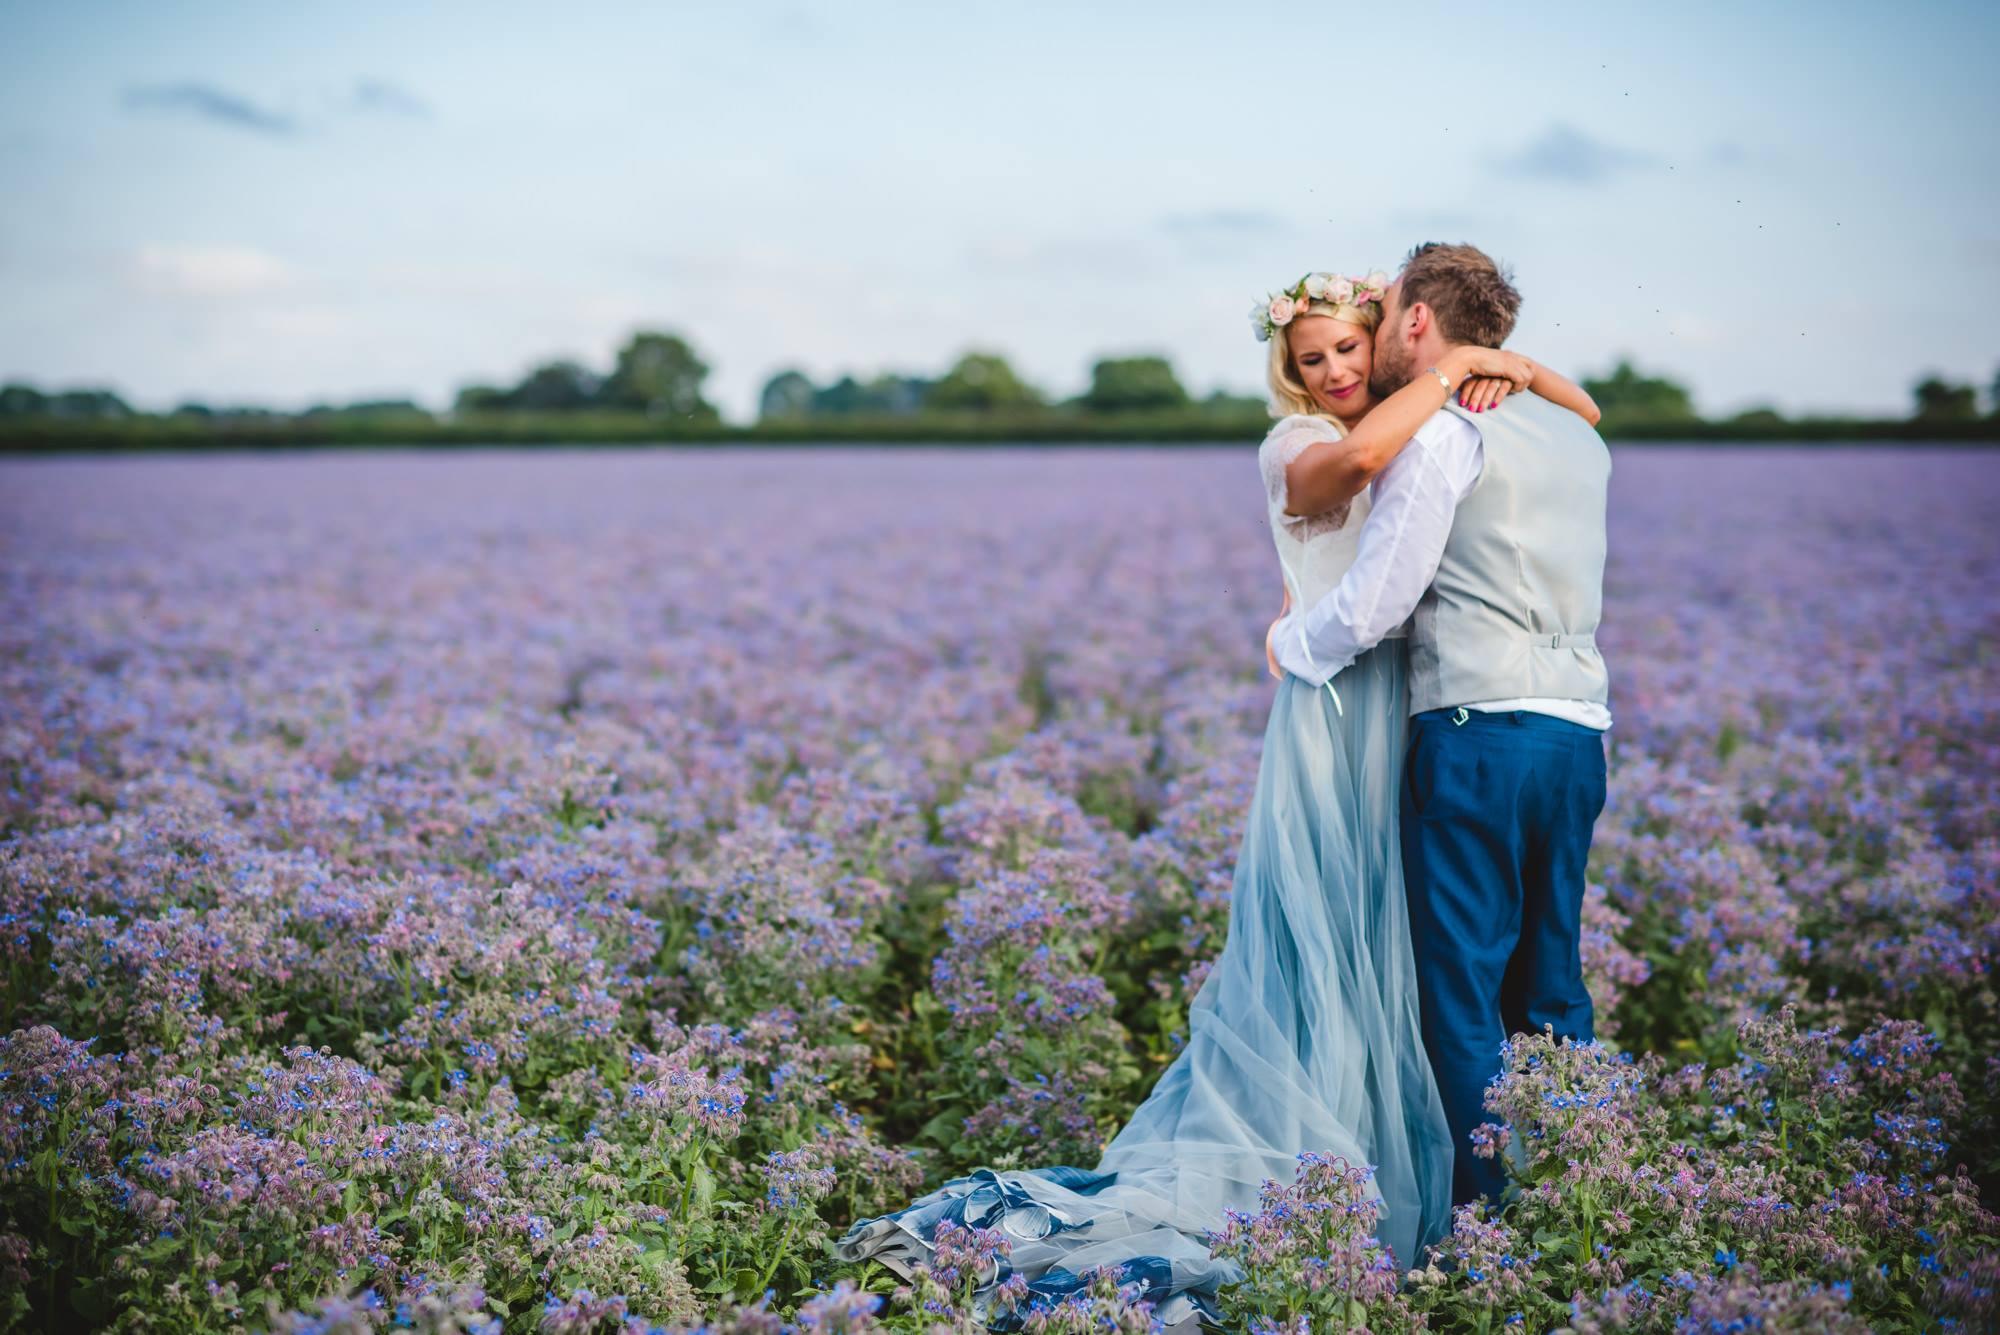 Sophie Duckworth Photography